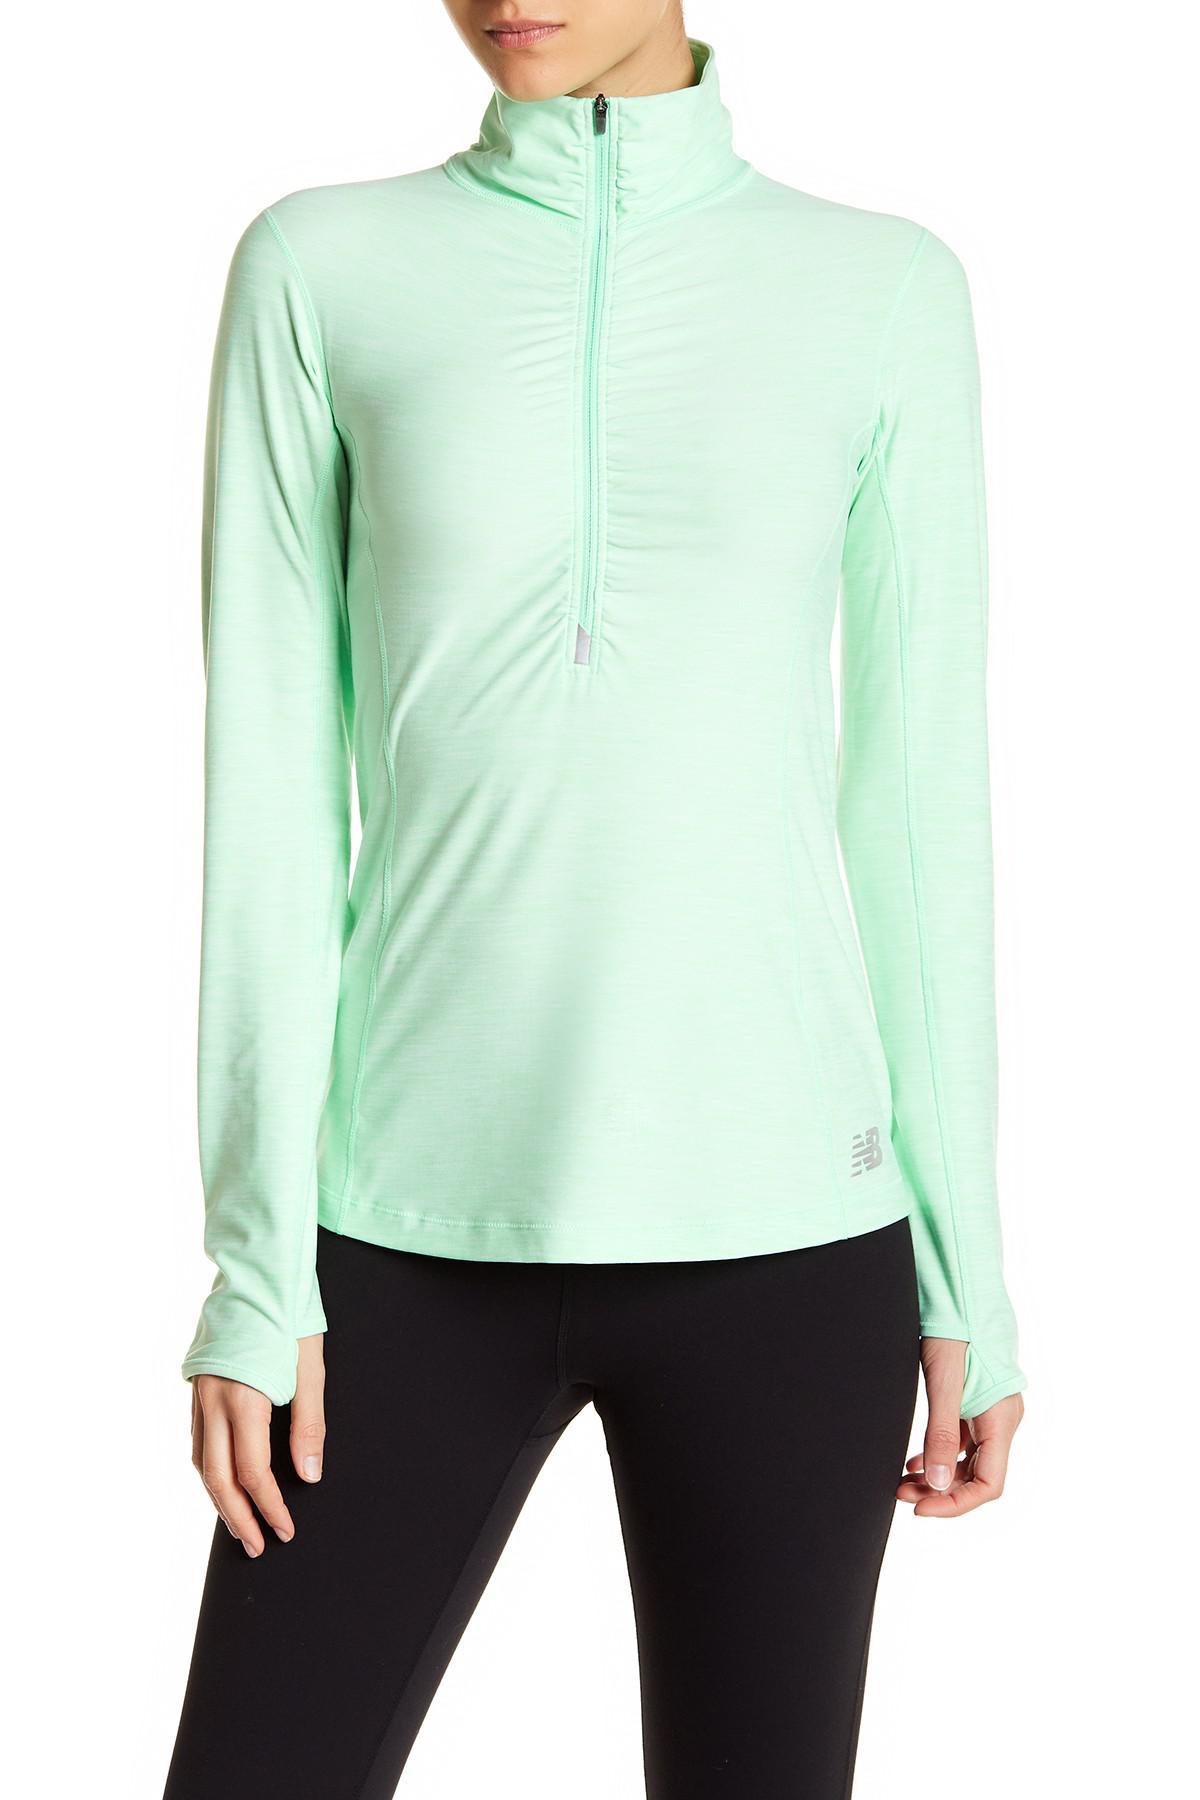 New balance half zip long sleeve moisture wicking top in for Moisture wicking dress shirts